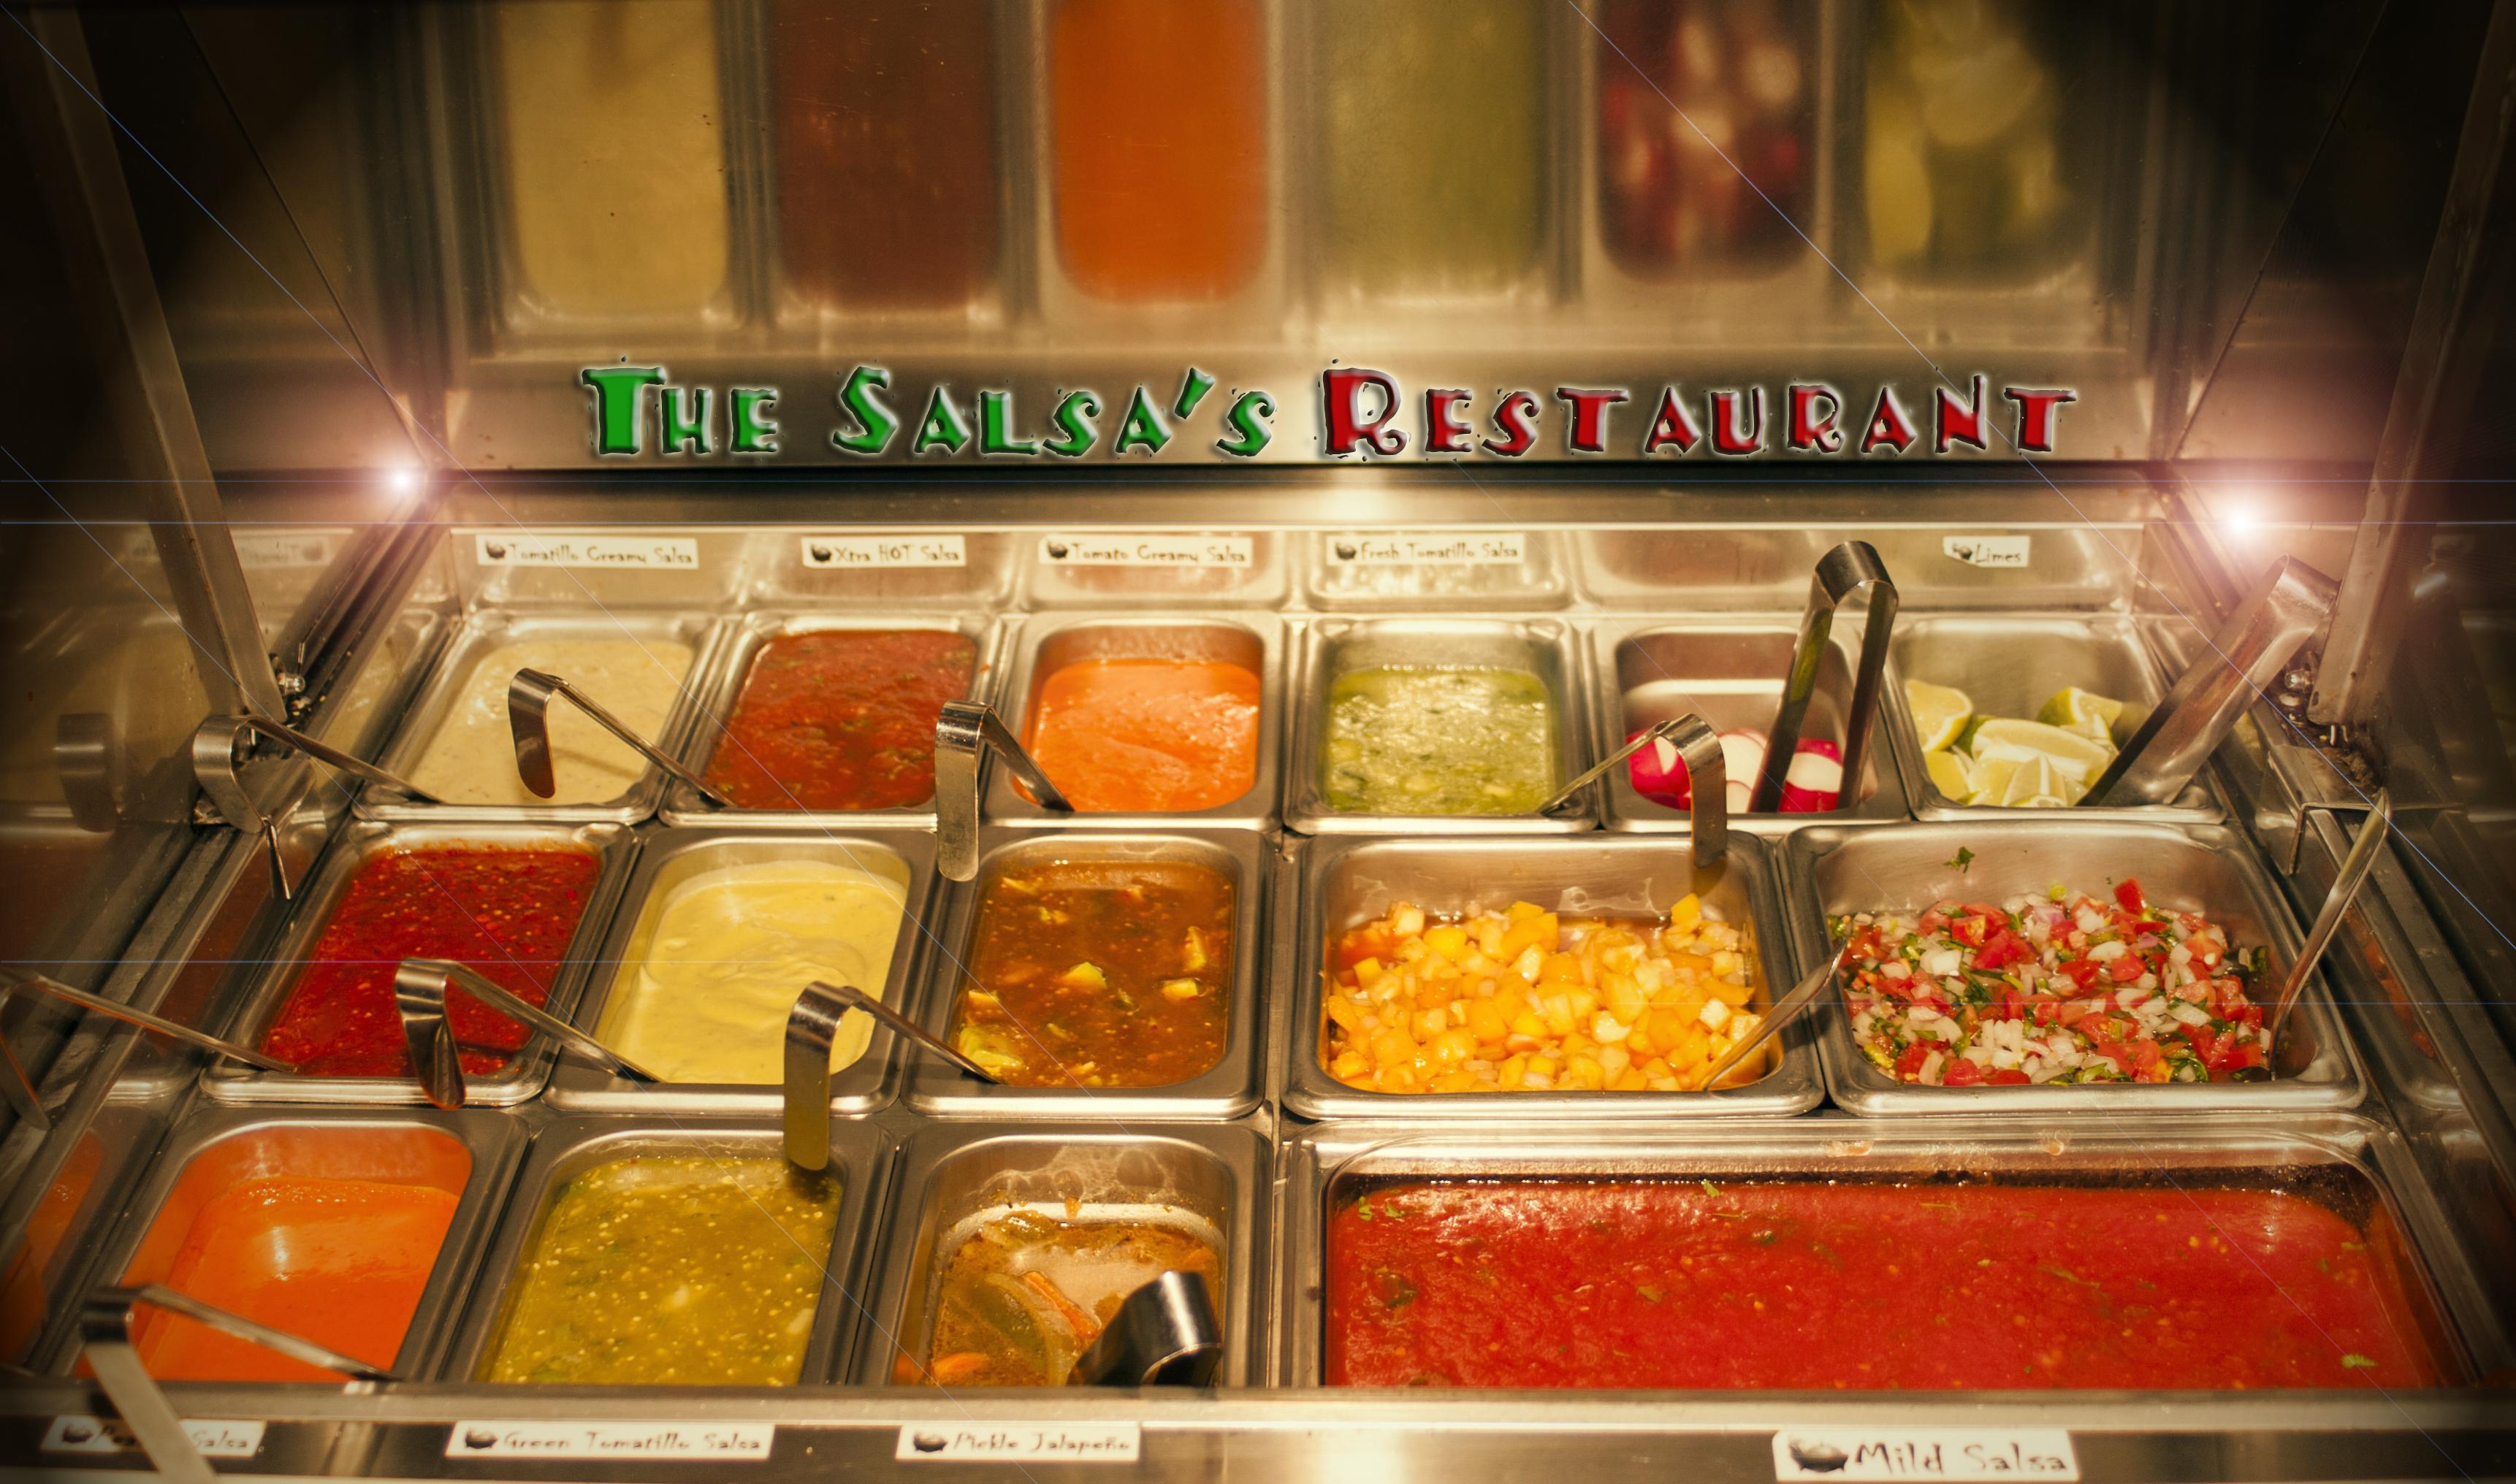 The Salsas Restaurant, Greeneville TN